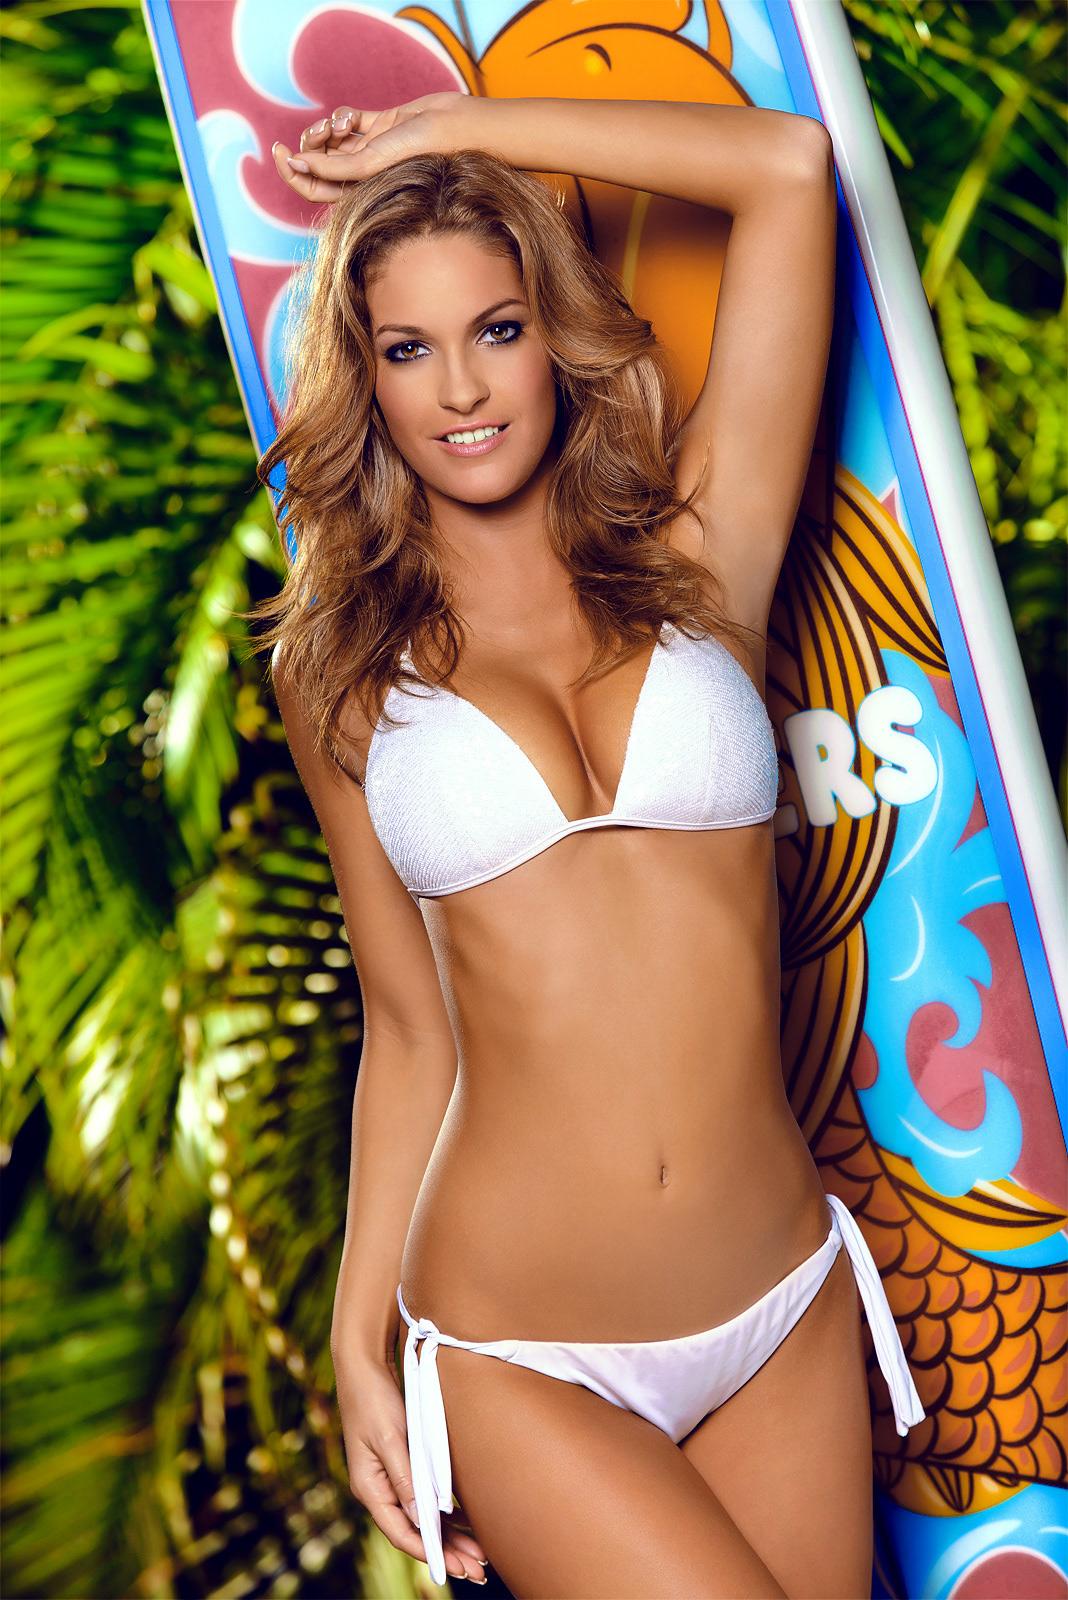 Tall sexy bikini contestants — 7